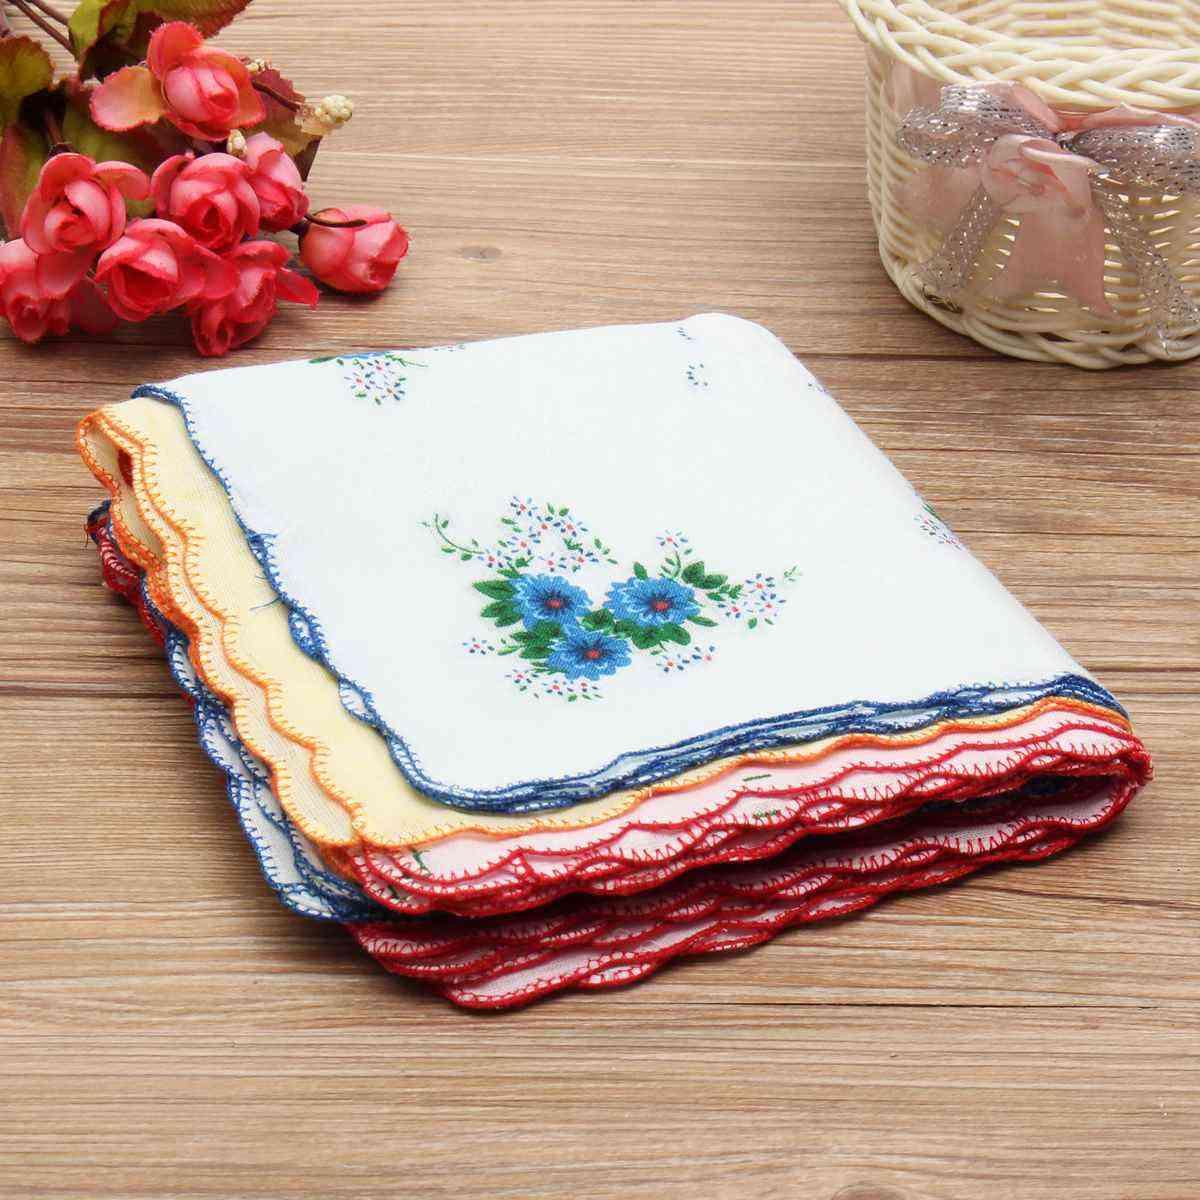 Vintage Style Floral Flower Bird Handkerchief - Lady Women Kids Cotton Hanky